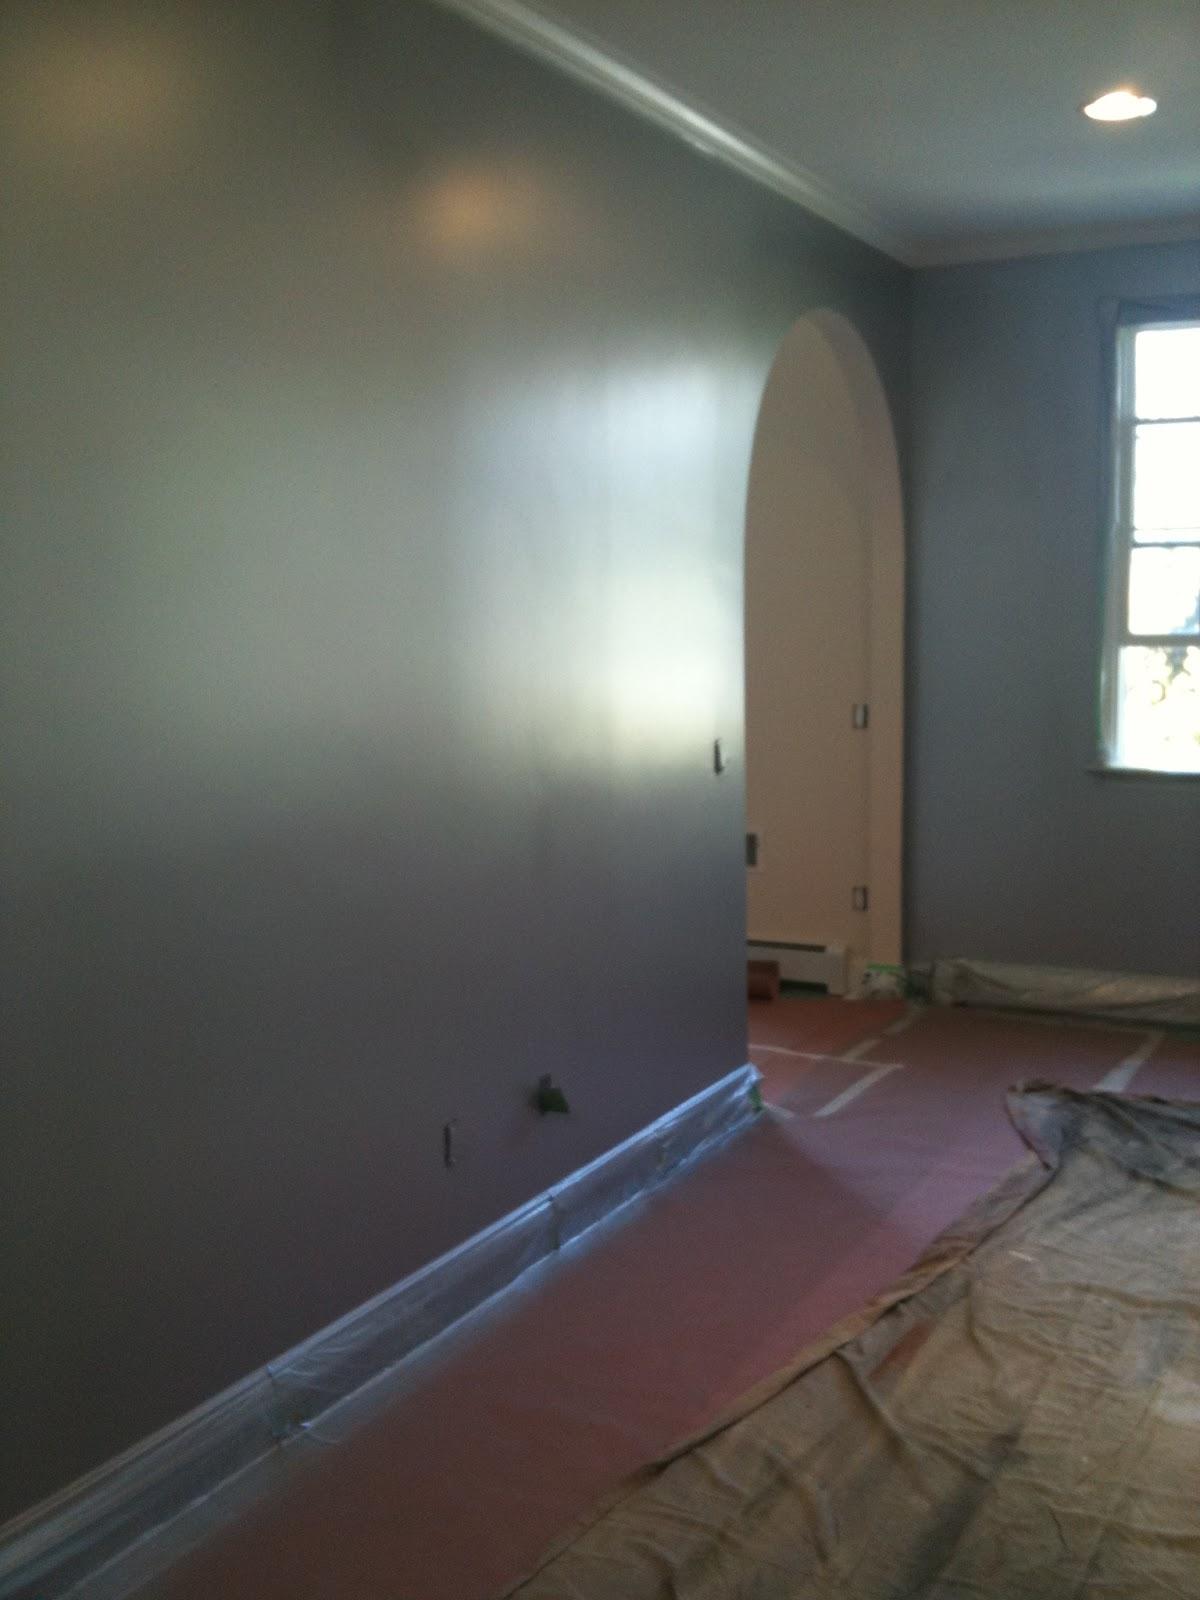 Metallic silver wall paint three walls of this living - Silver metallic wall paint ...